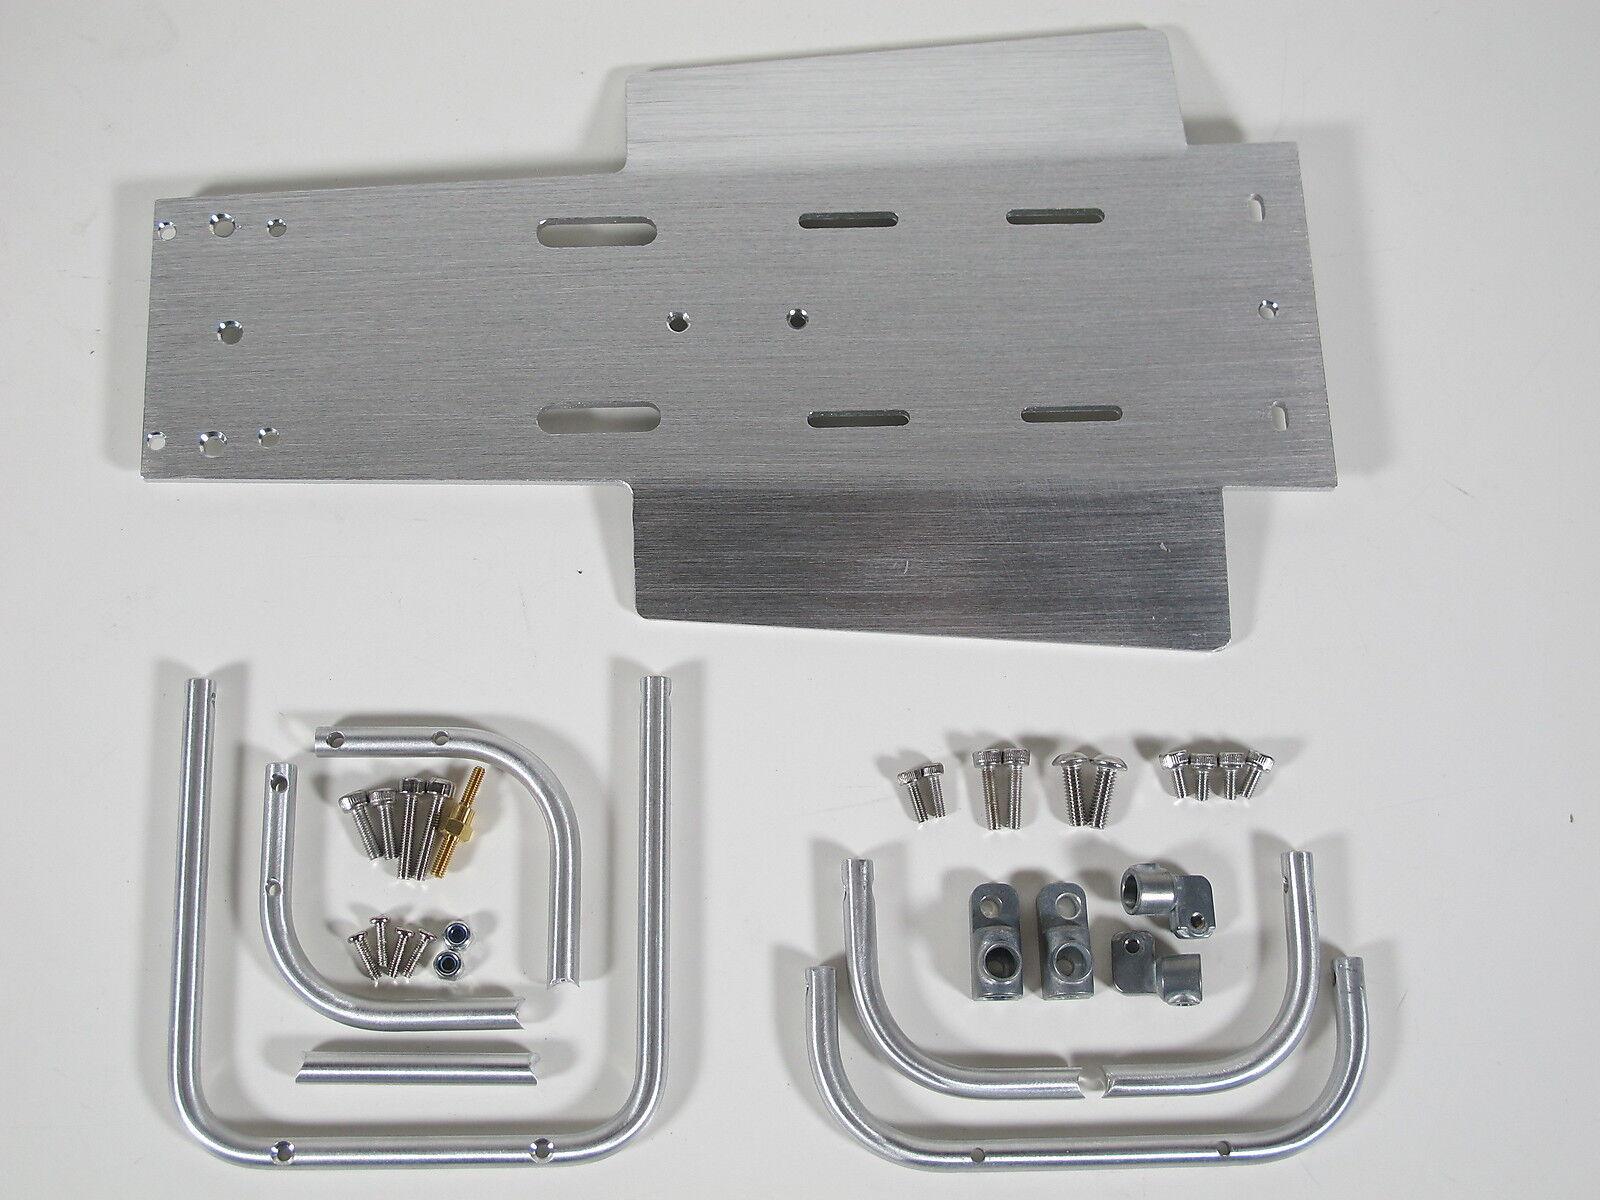 Tamiya 1/10 Aluminio Delantero Trasero Protector De Parachoques  placa de chasis Arena lnfernal Champ